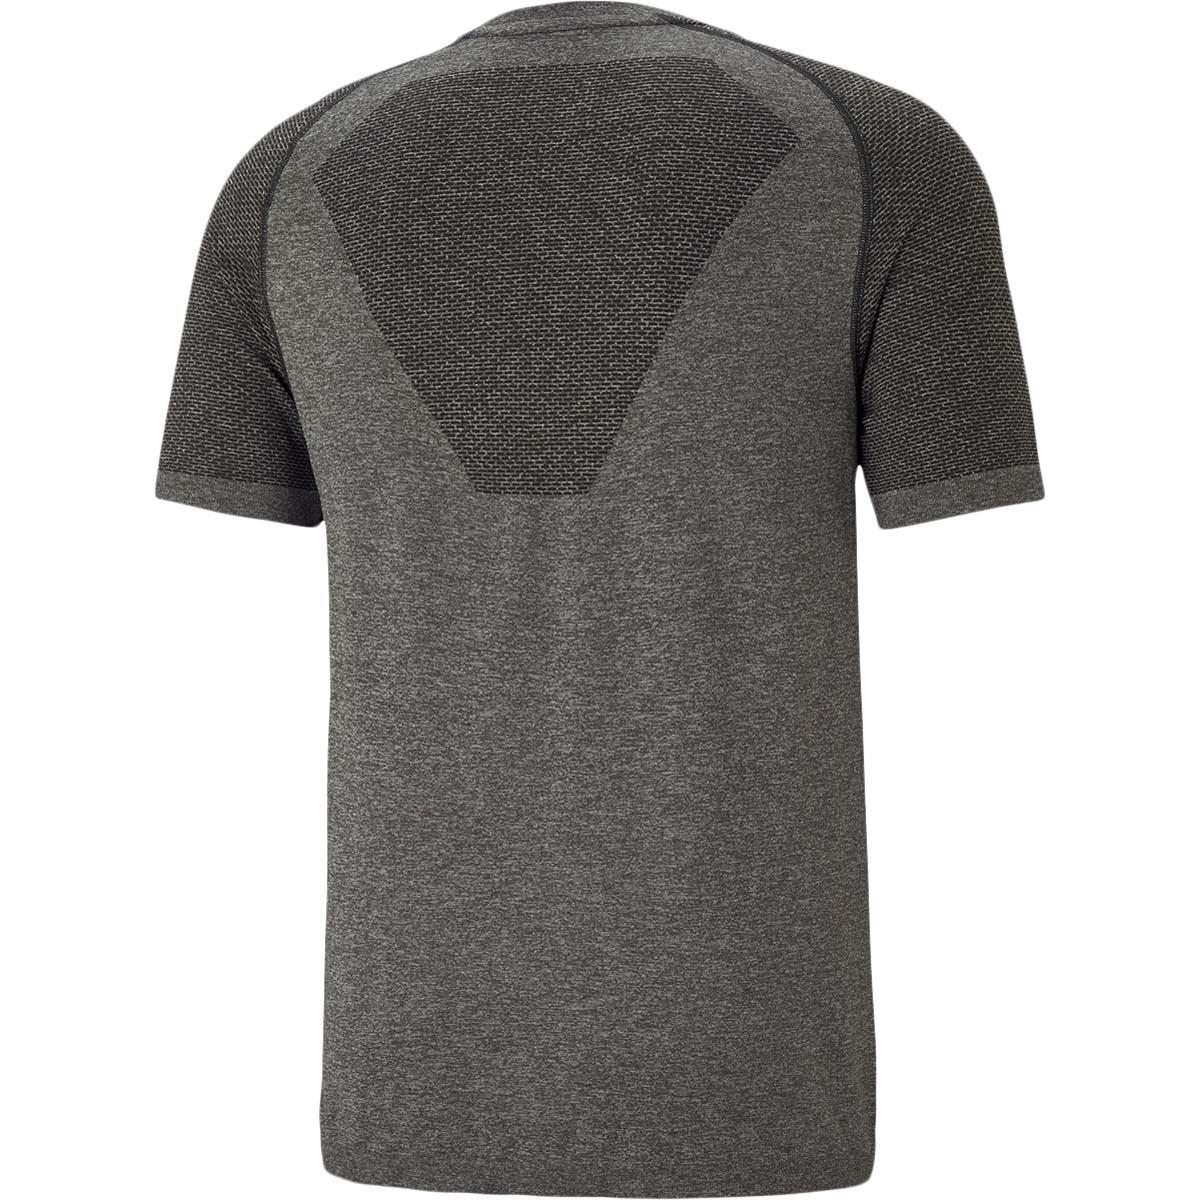 Puma RTG evoKNIT Basic Trænings T-shirt Herre